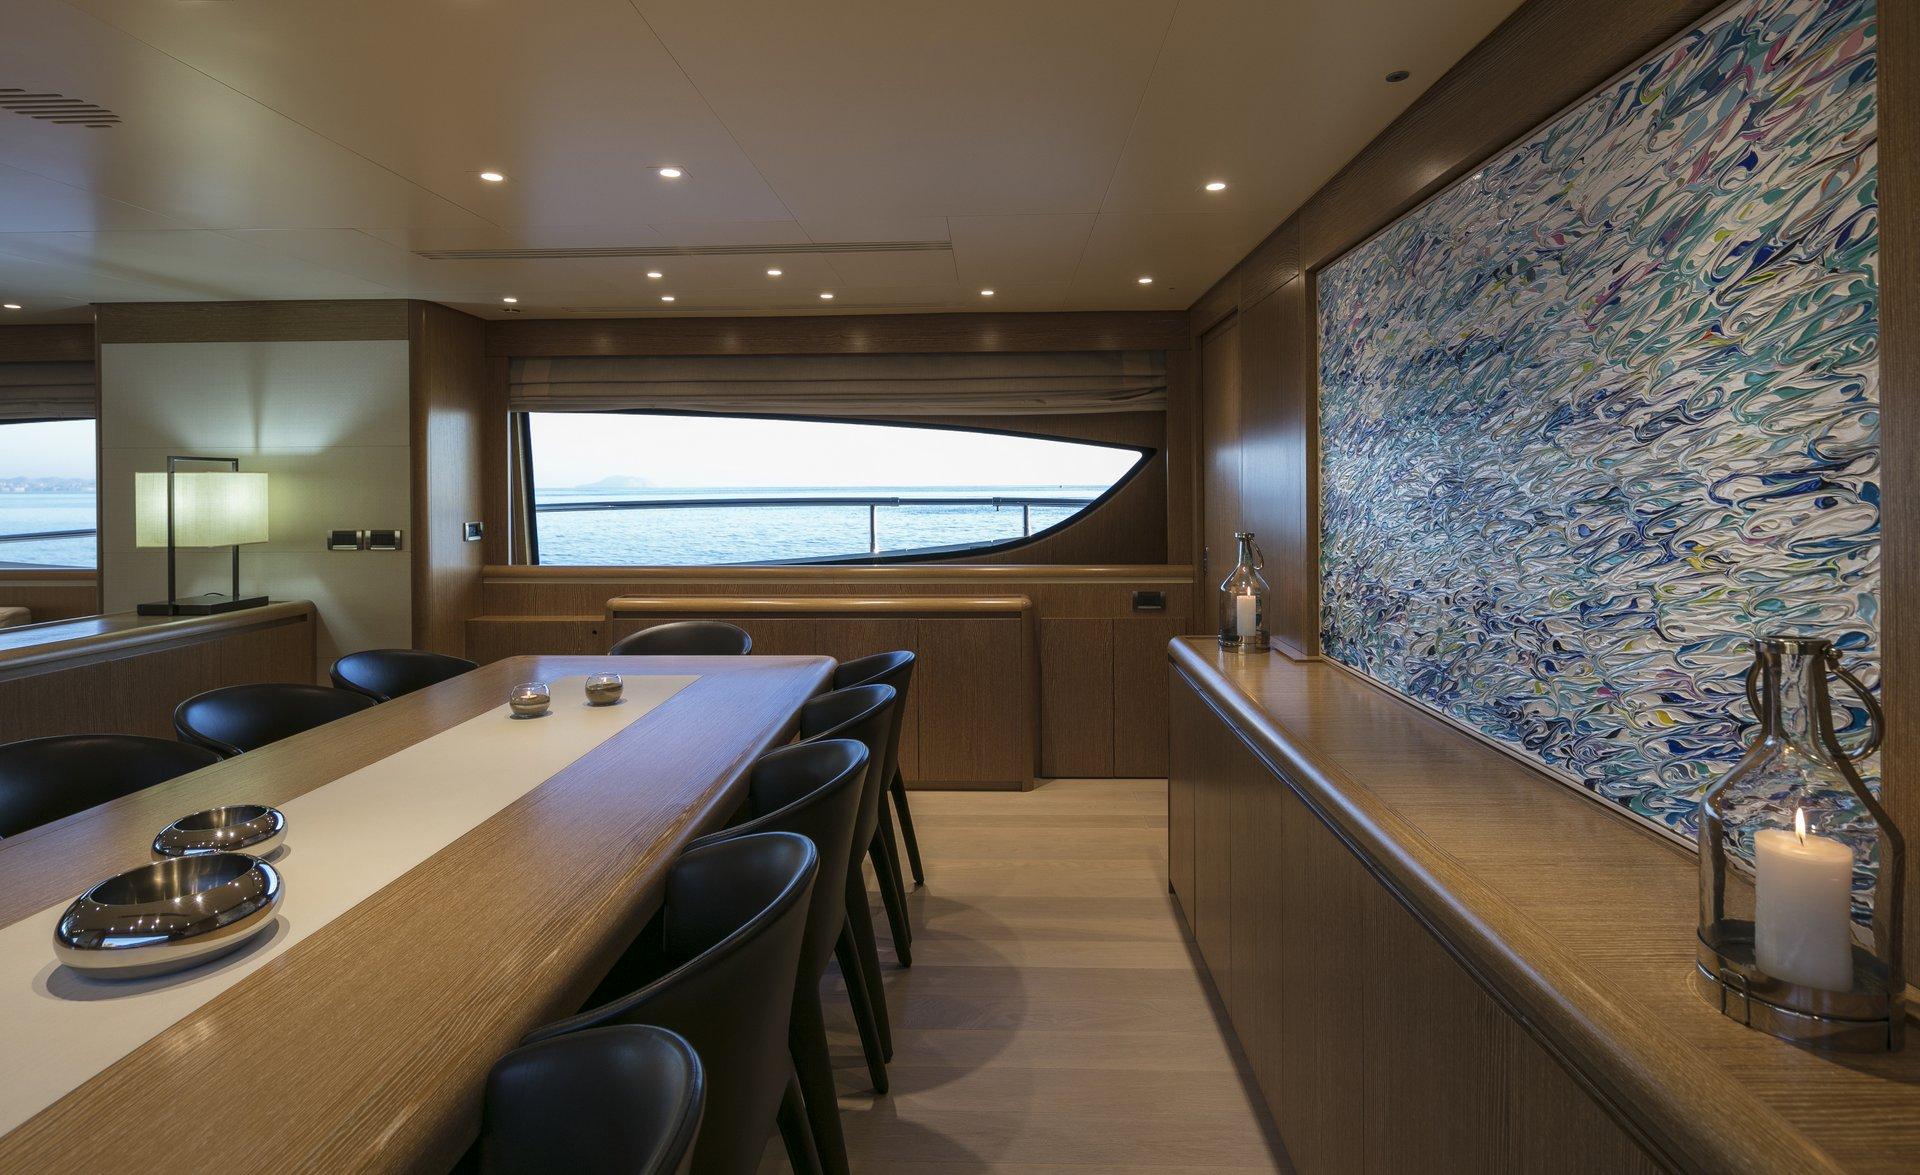 M/Y RINI V yacht for charter art